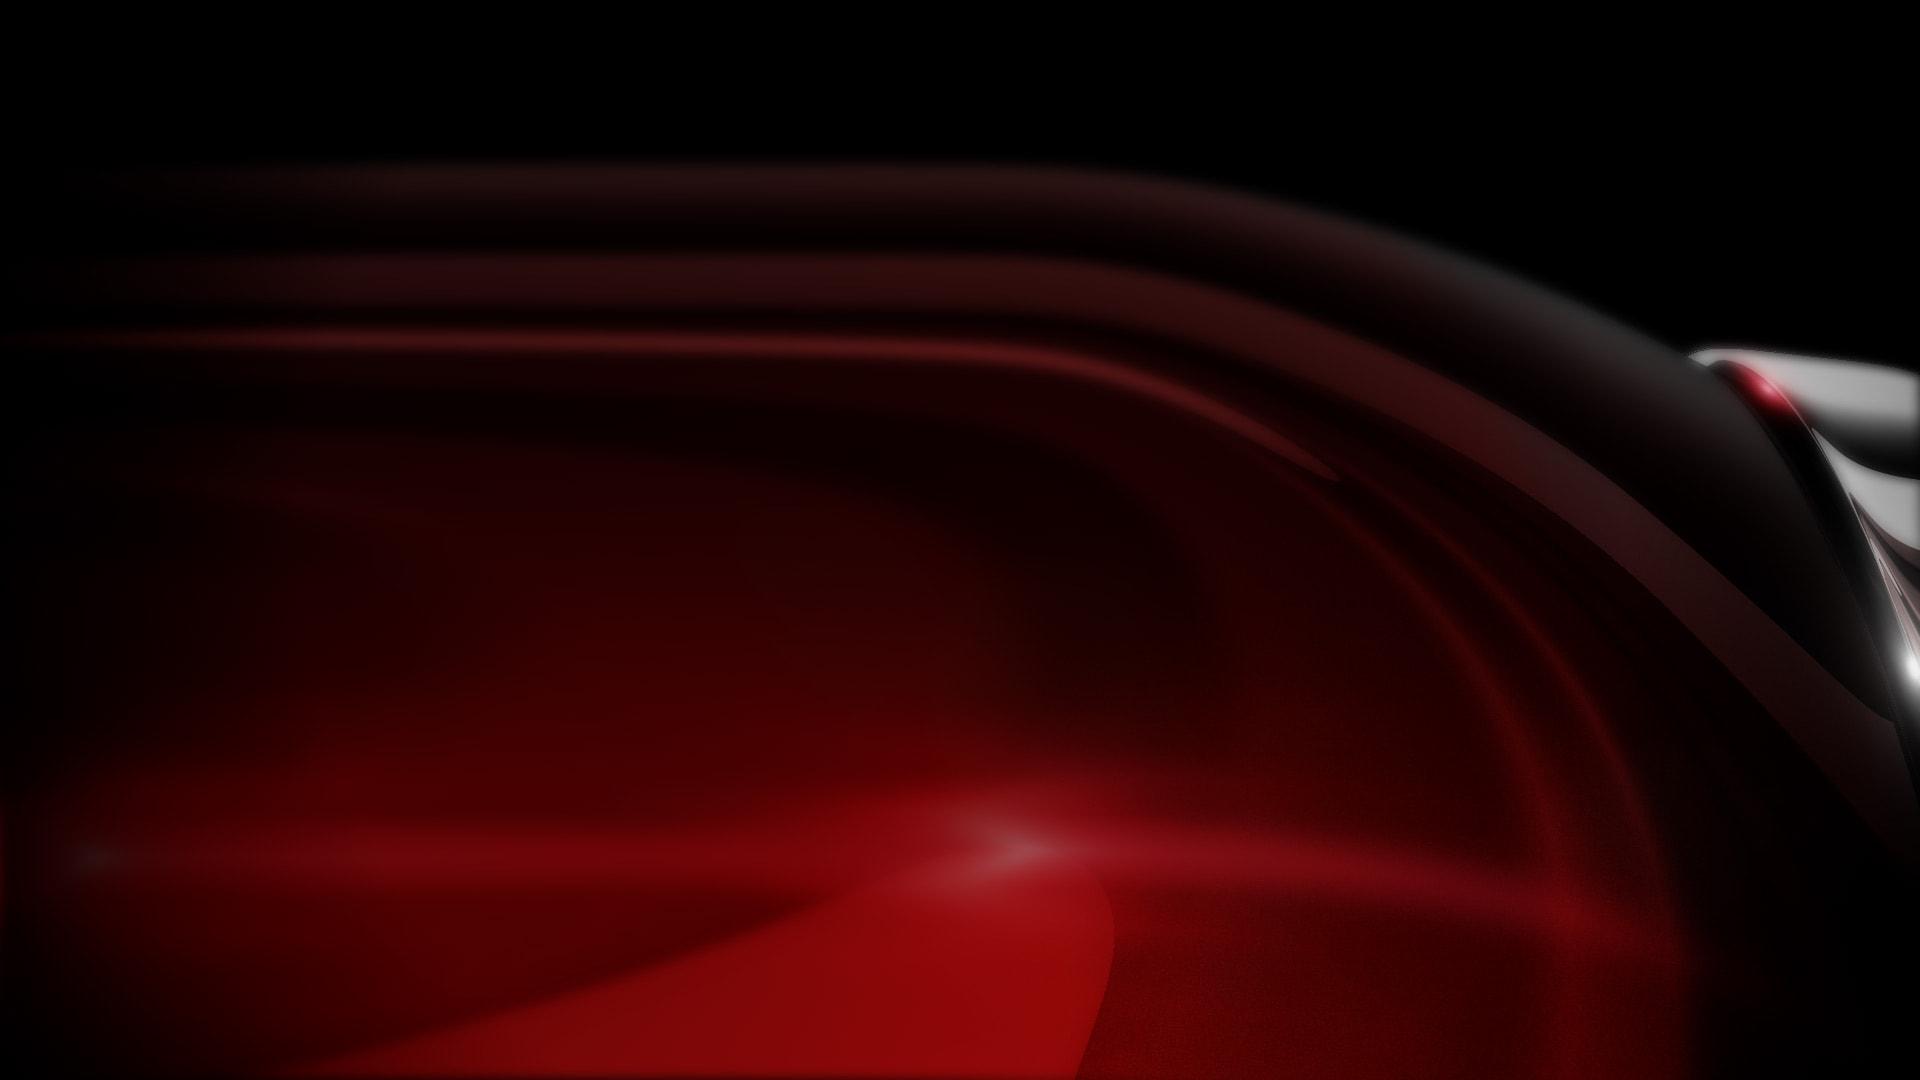 ferrari-details-suspect-santasombra-victor-ruano